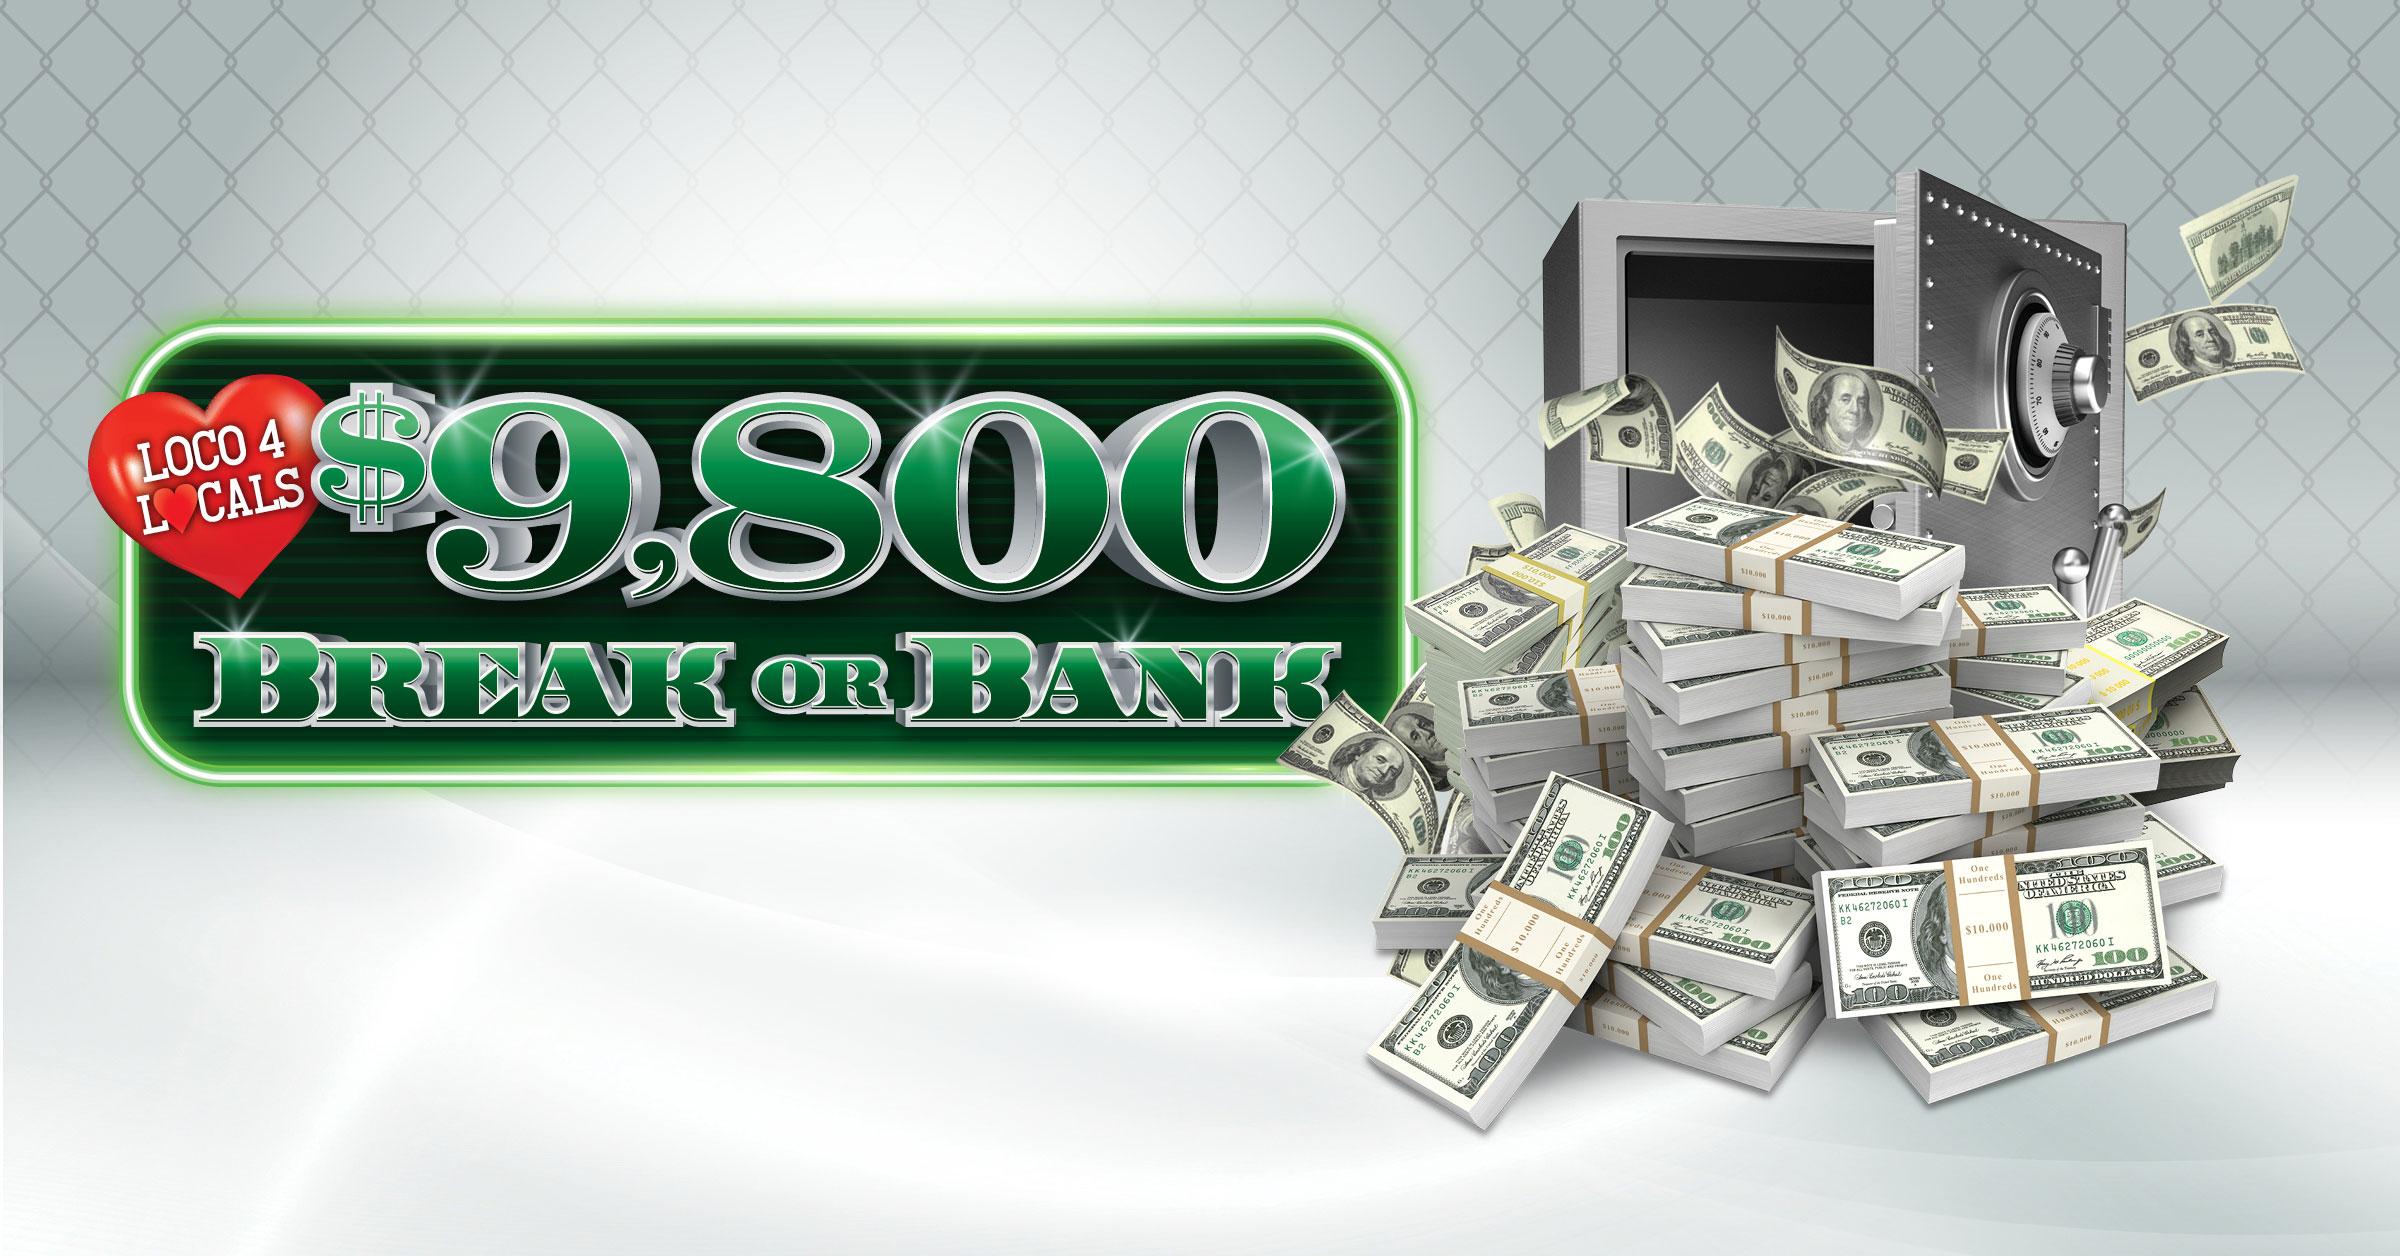 Loco 4 Locals - Break or Bank